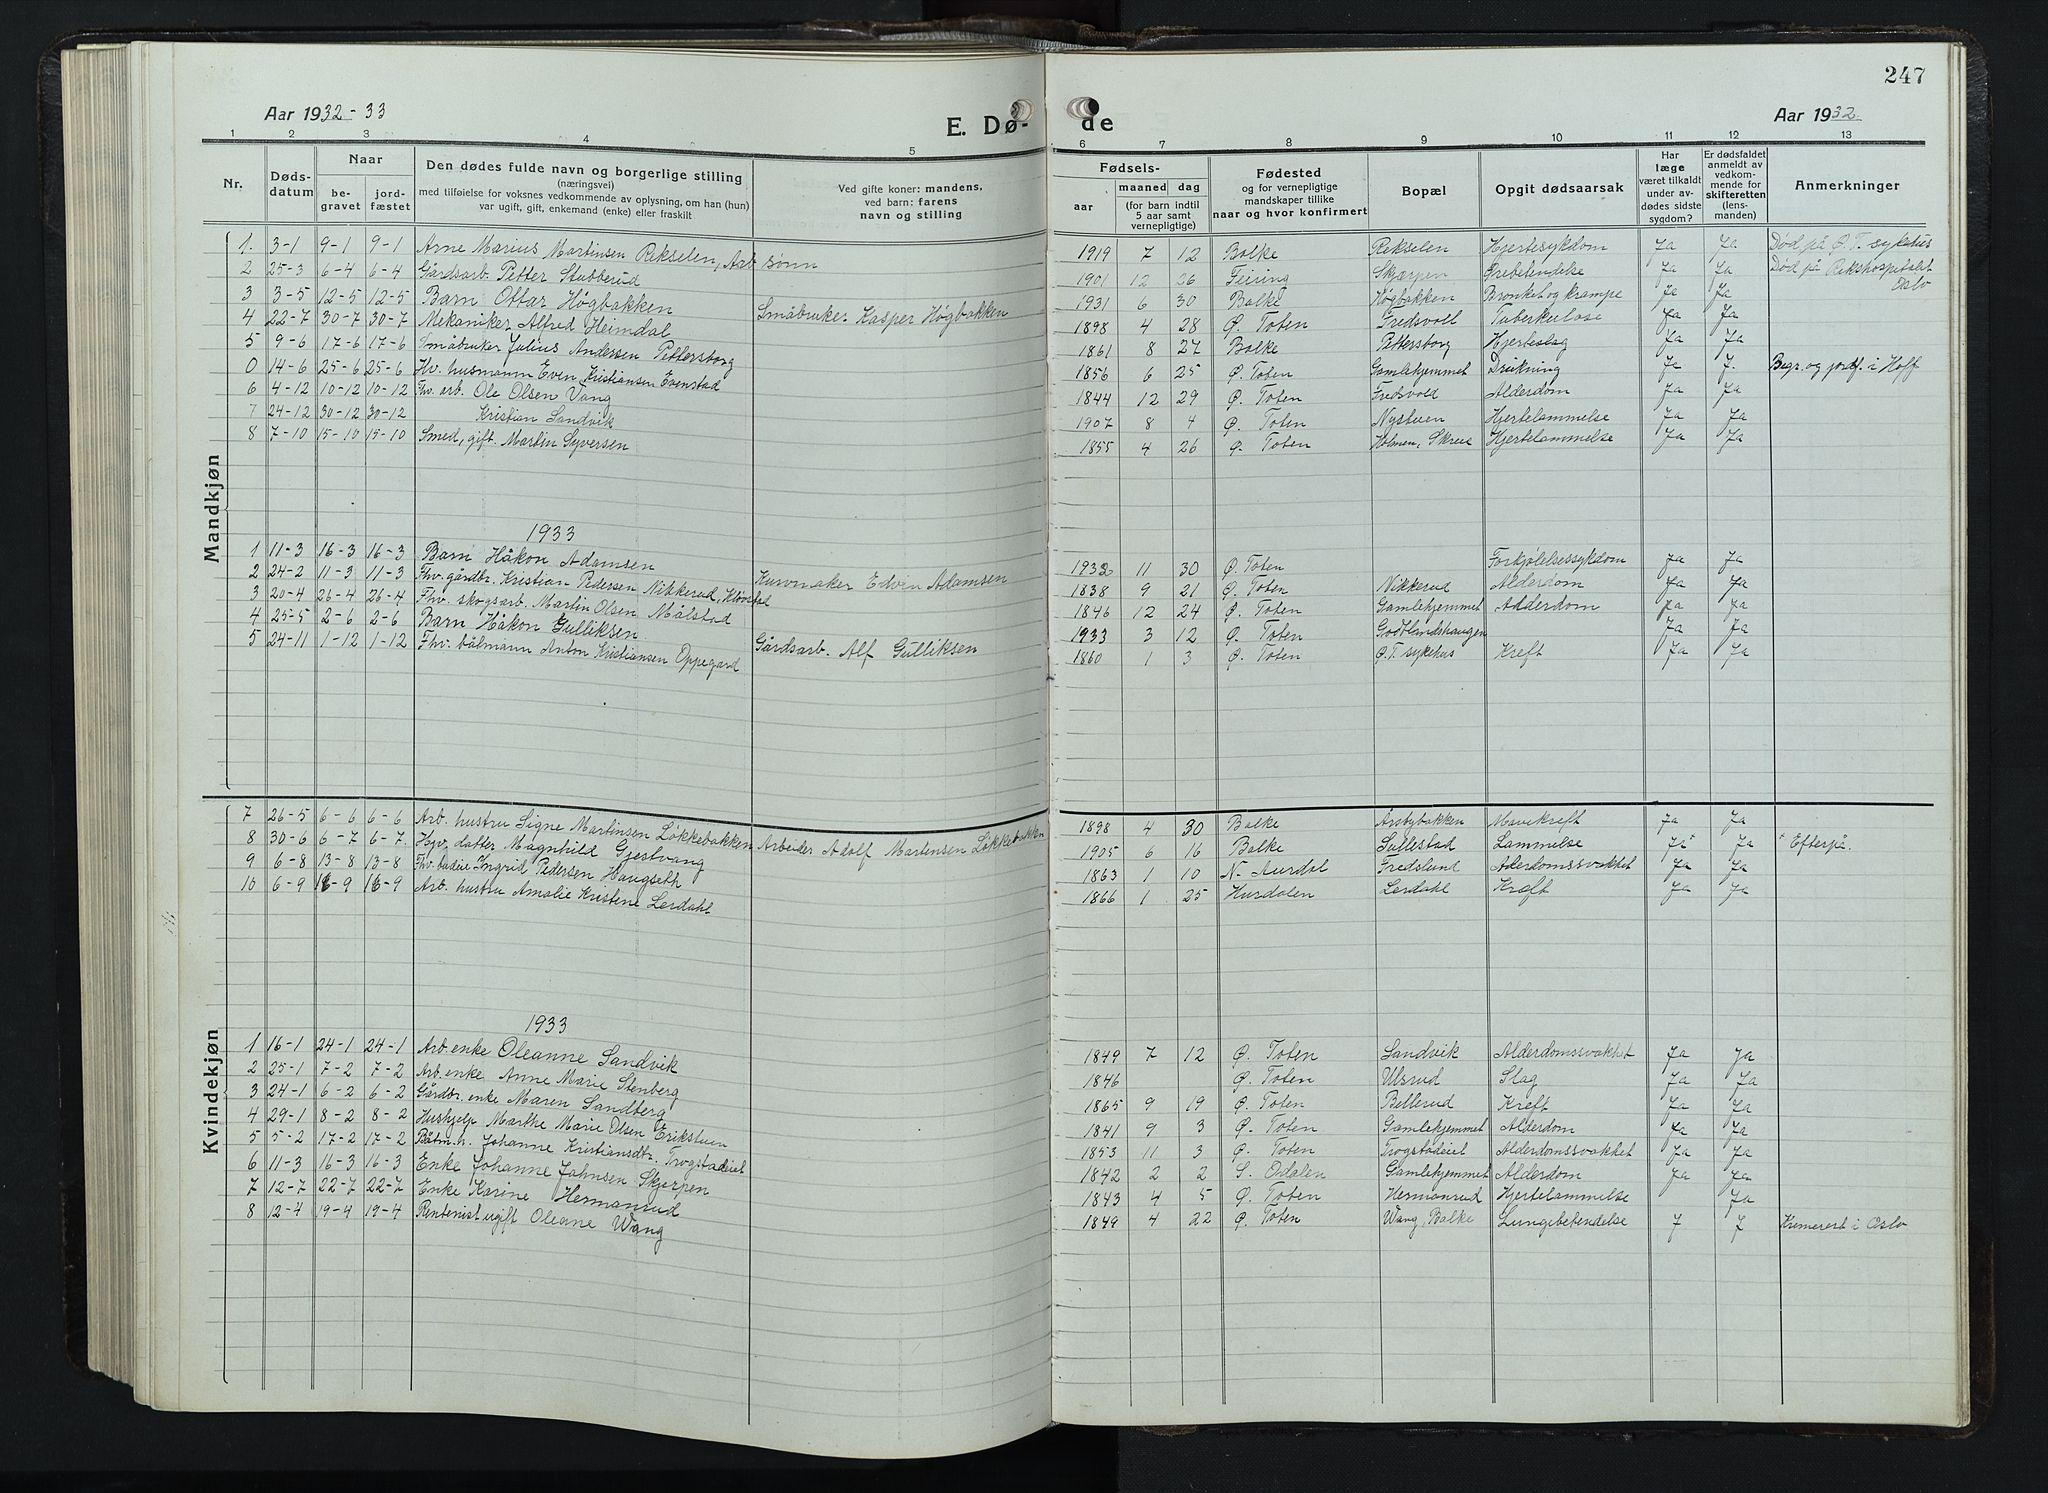 SAH, Balke prestekontor, Klokkerbok nr. 1, 1920-1955, s. 247